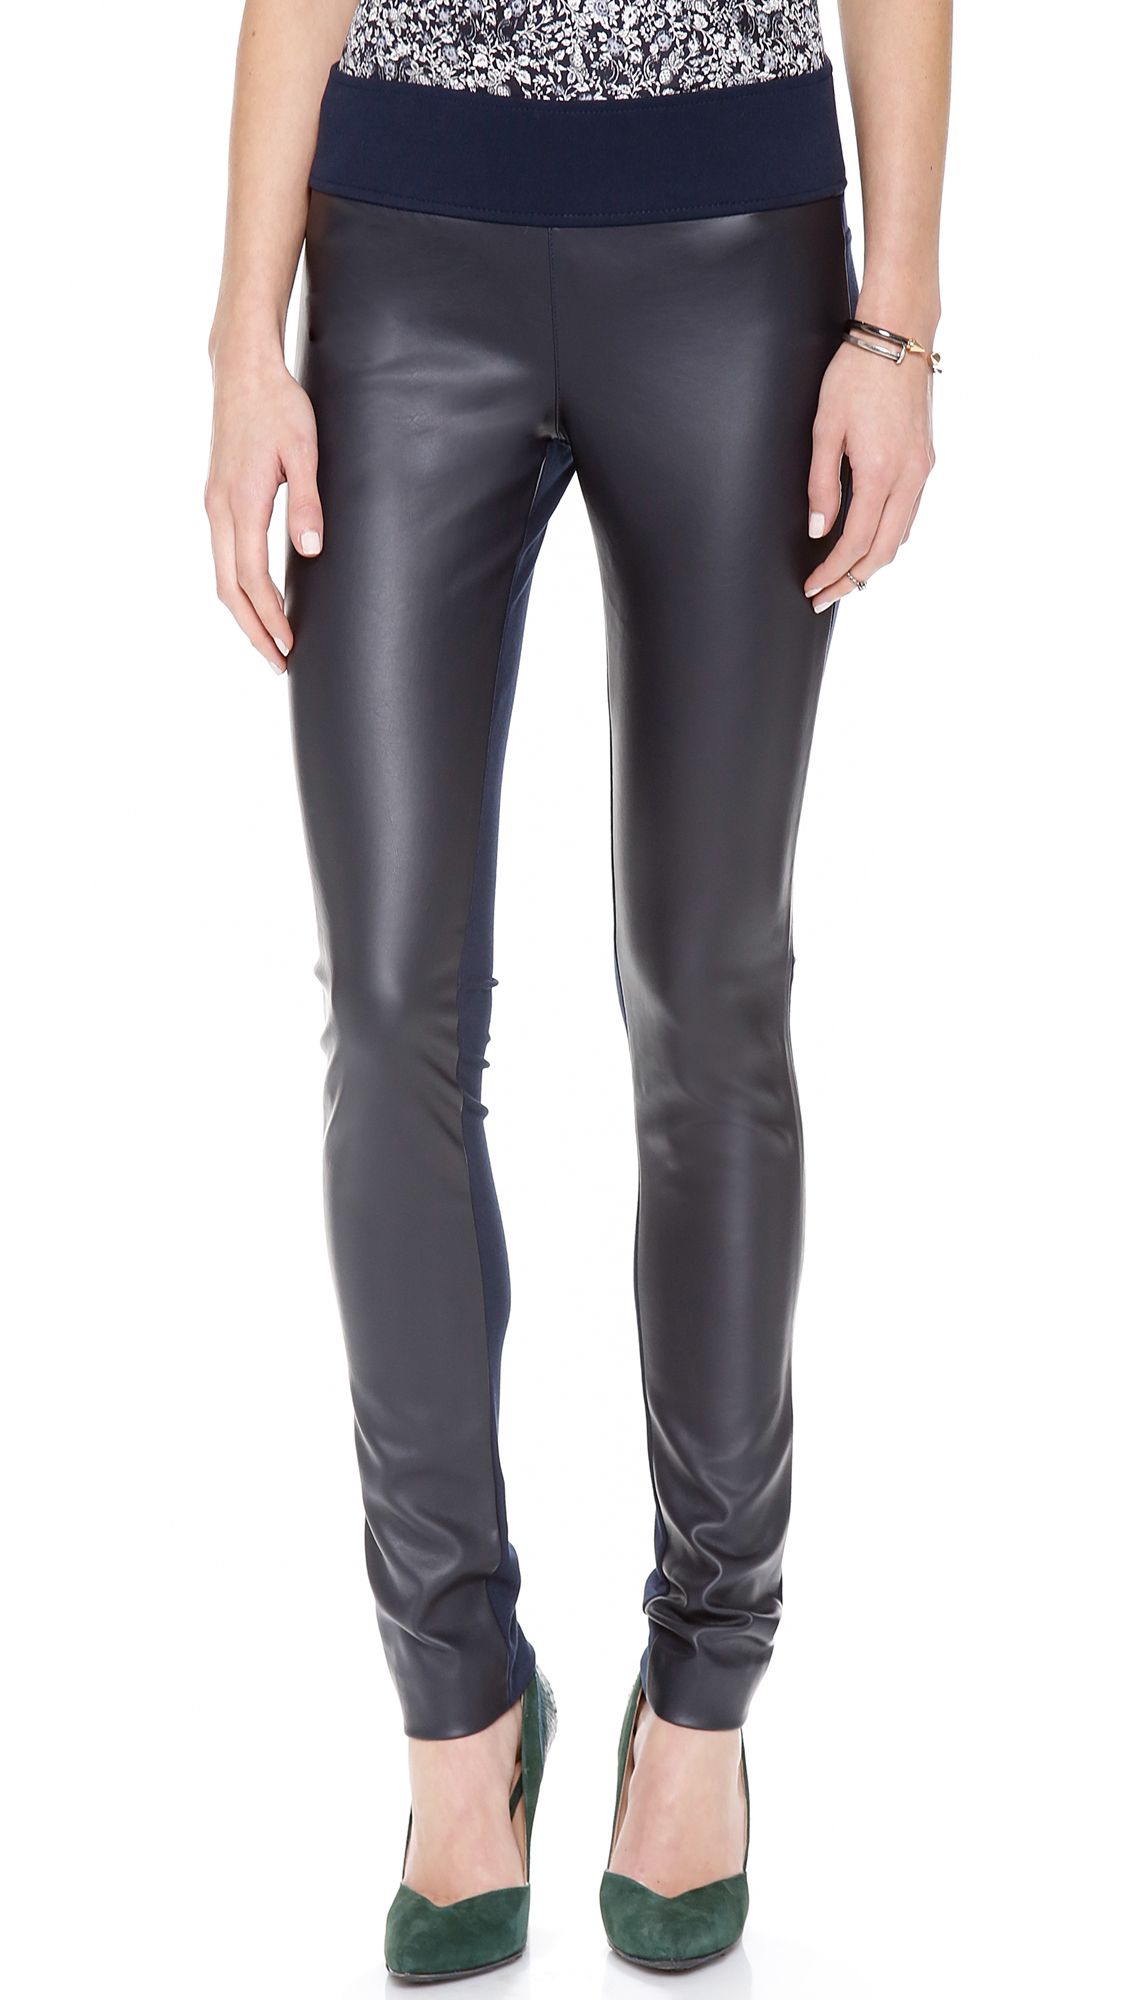 873304d28151d Lyst - Club Monaco Tasha Leggings in Black